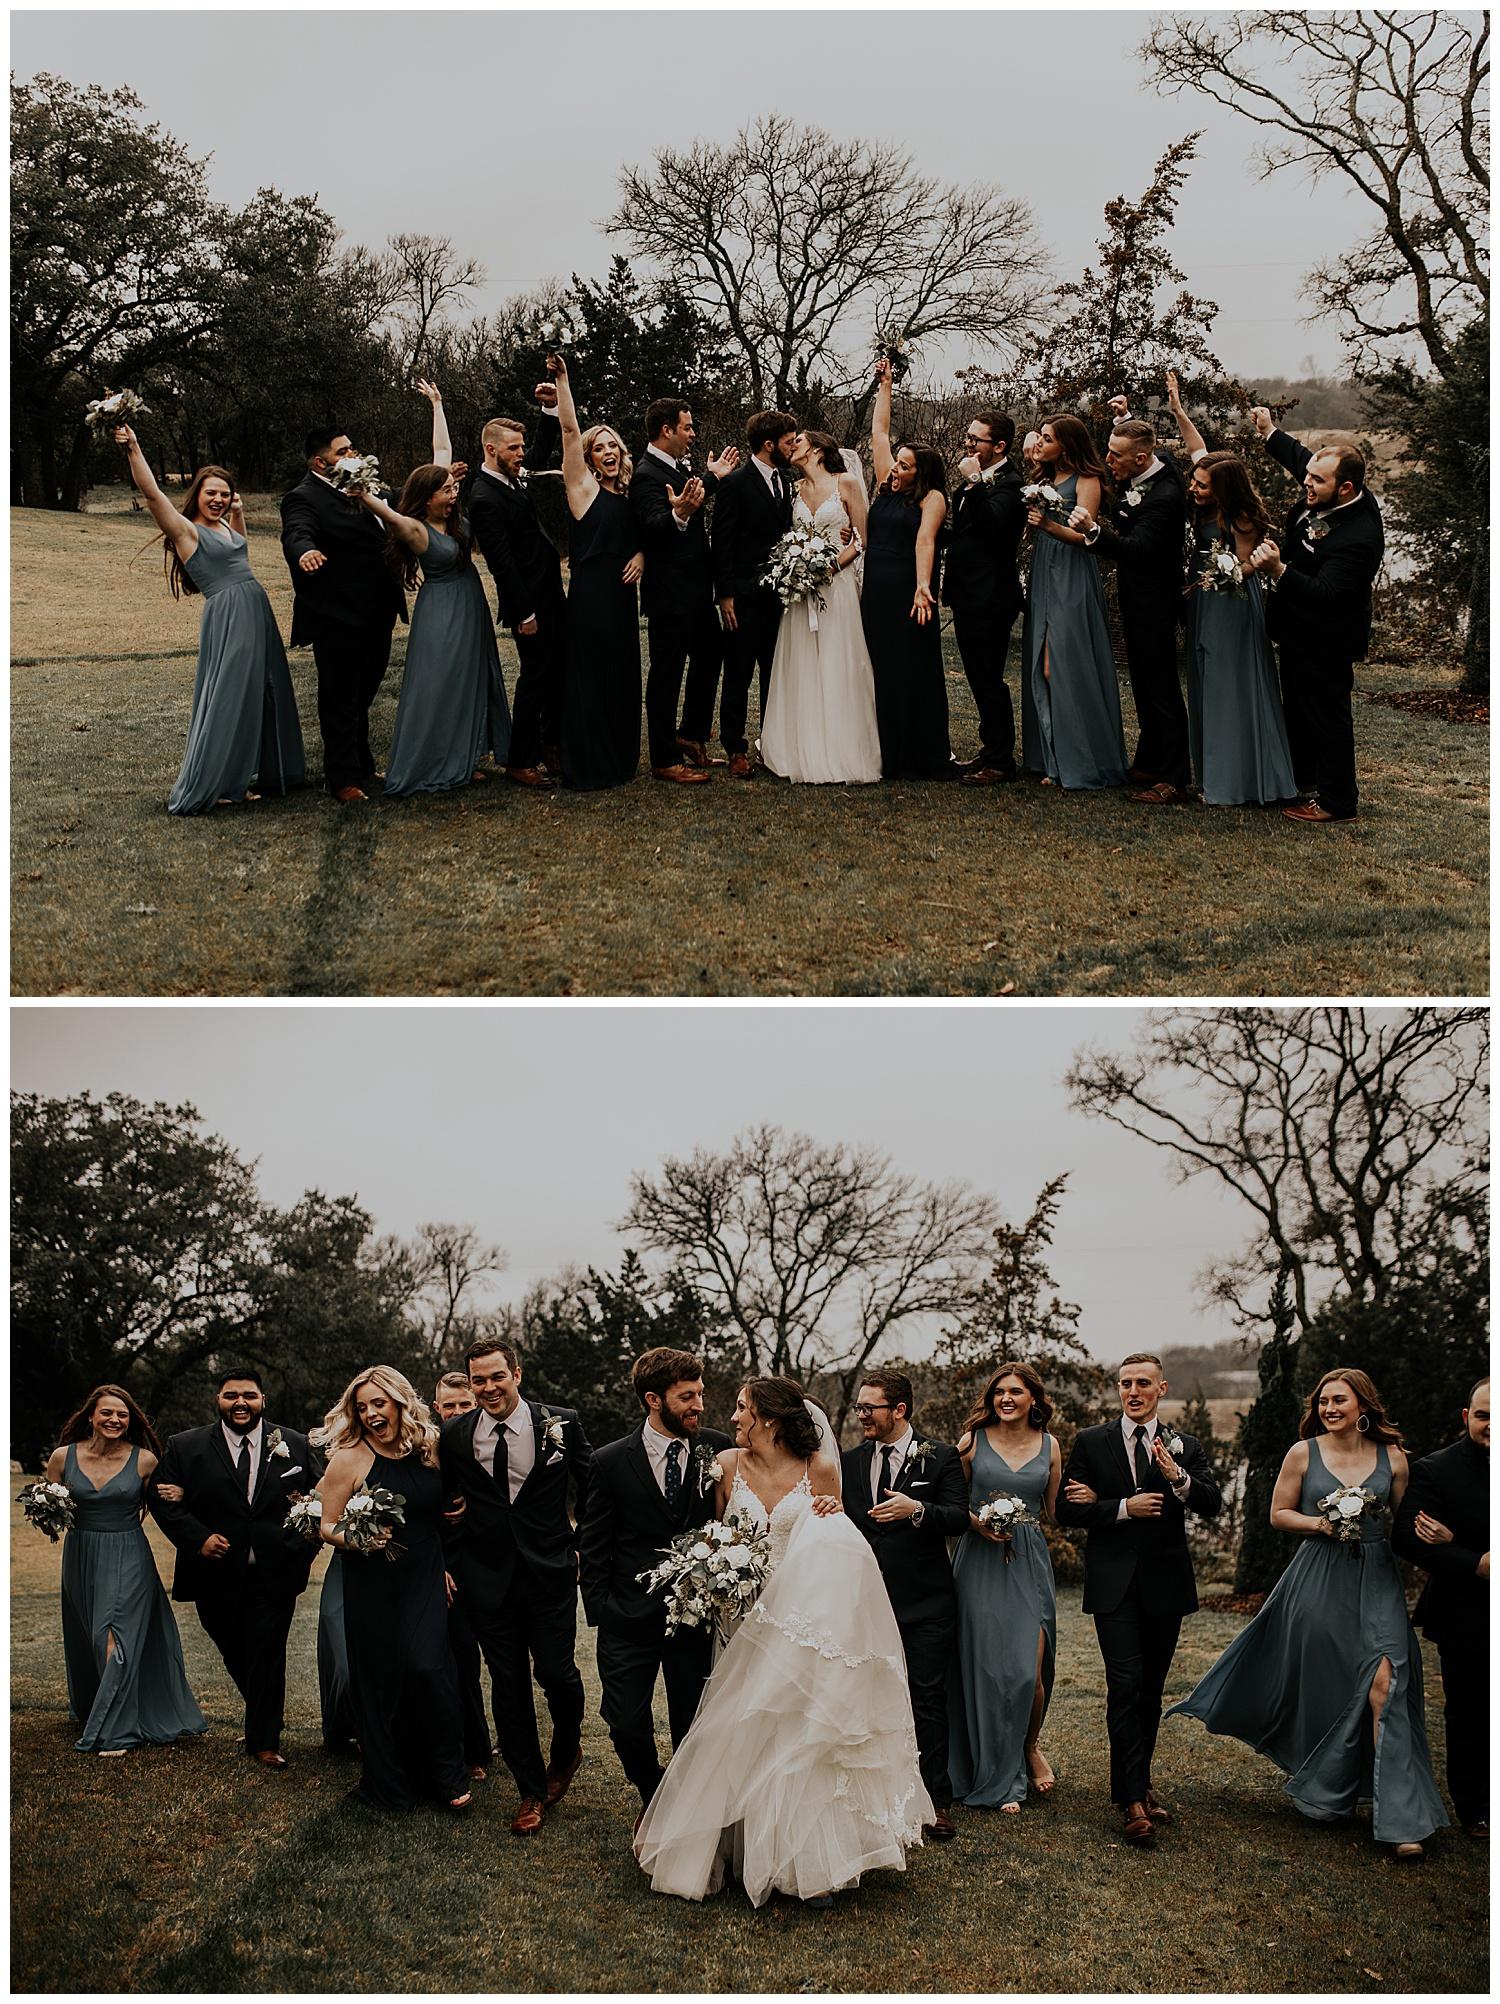 Laken-Mackenzie-Photography-Burge-Wedding-Stillwater-Meadow-Aledo-Texas-Dallas-Fort-Worth-Wedding-Photographer15.jpg